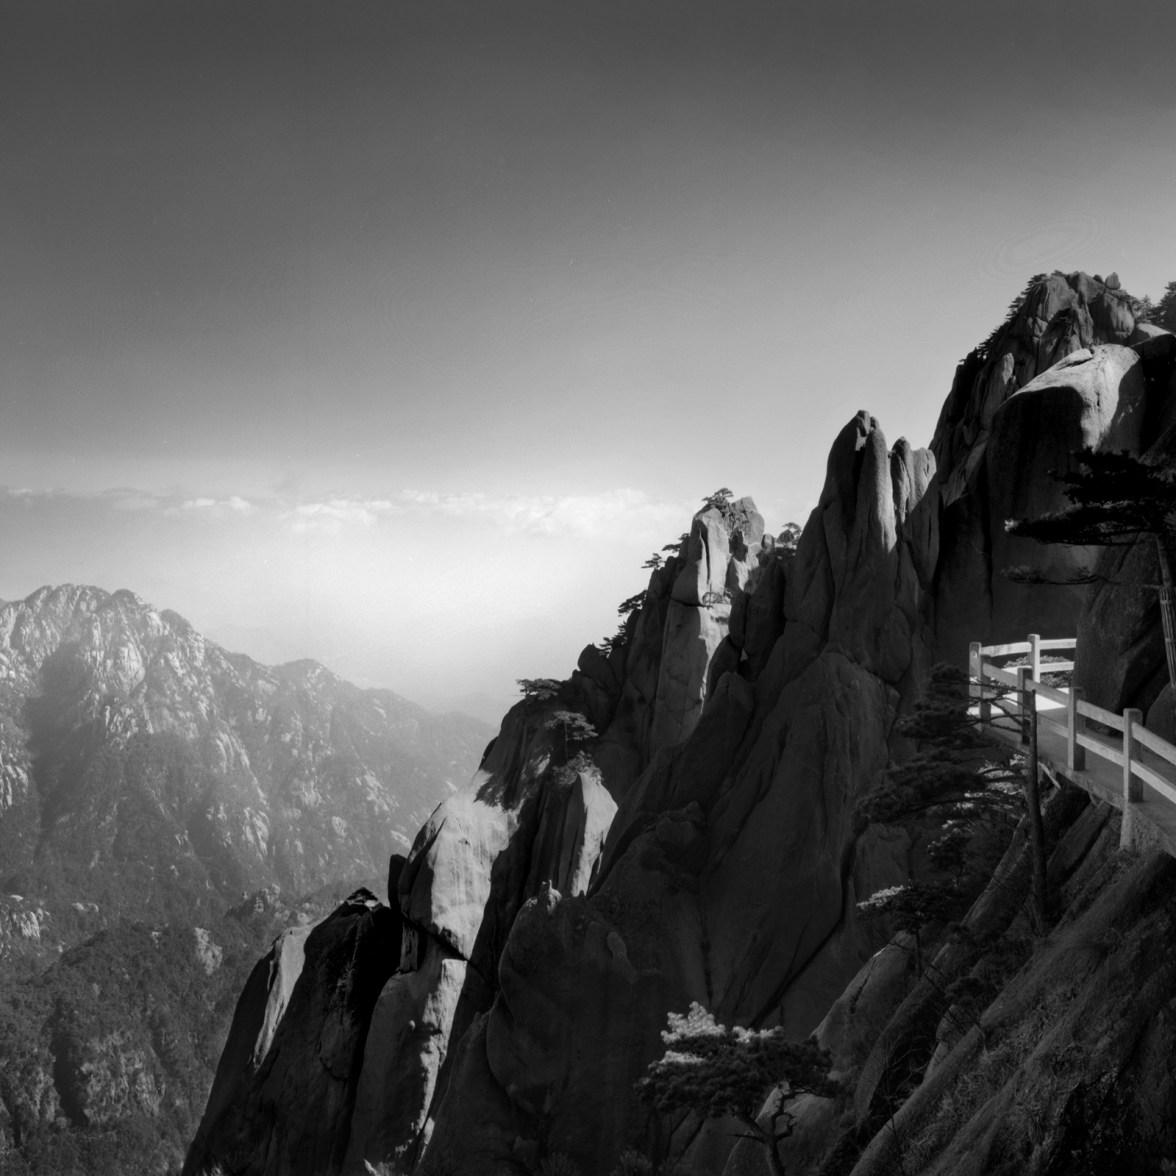 Pathway on the Edge © Alan Ross